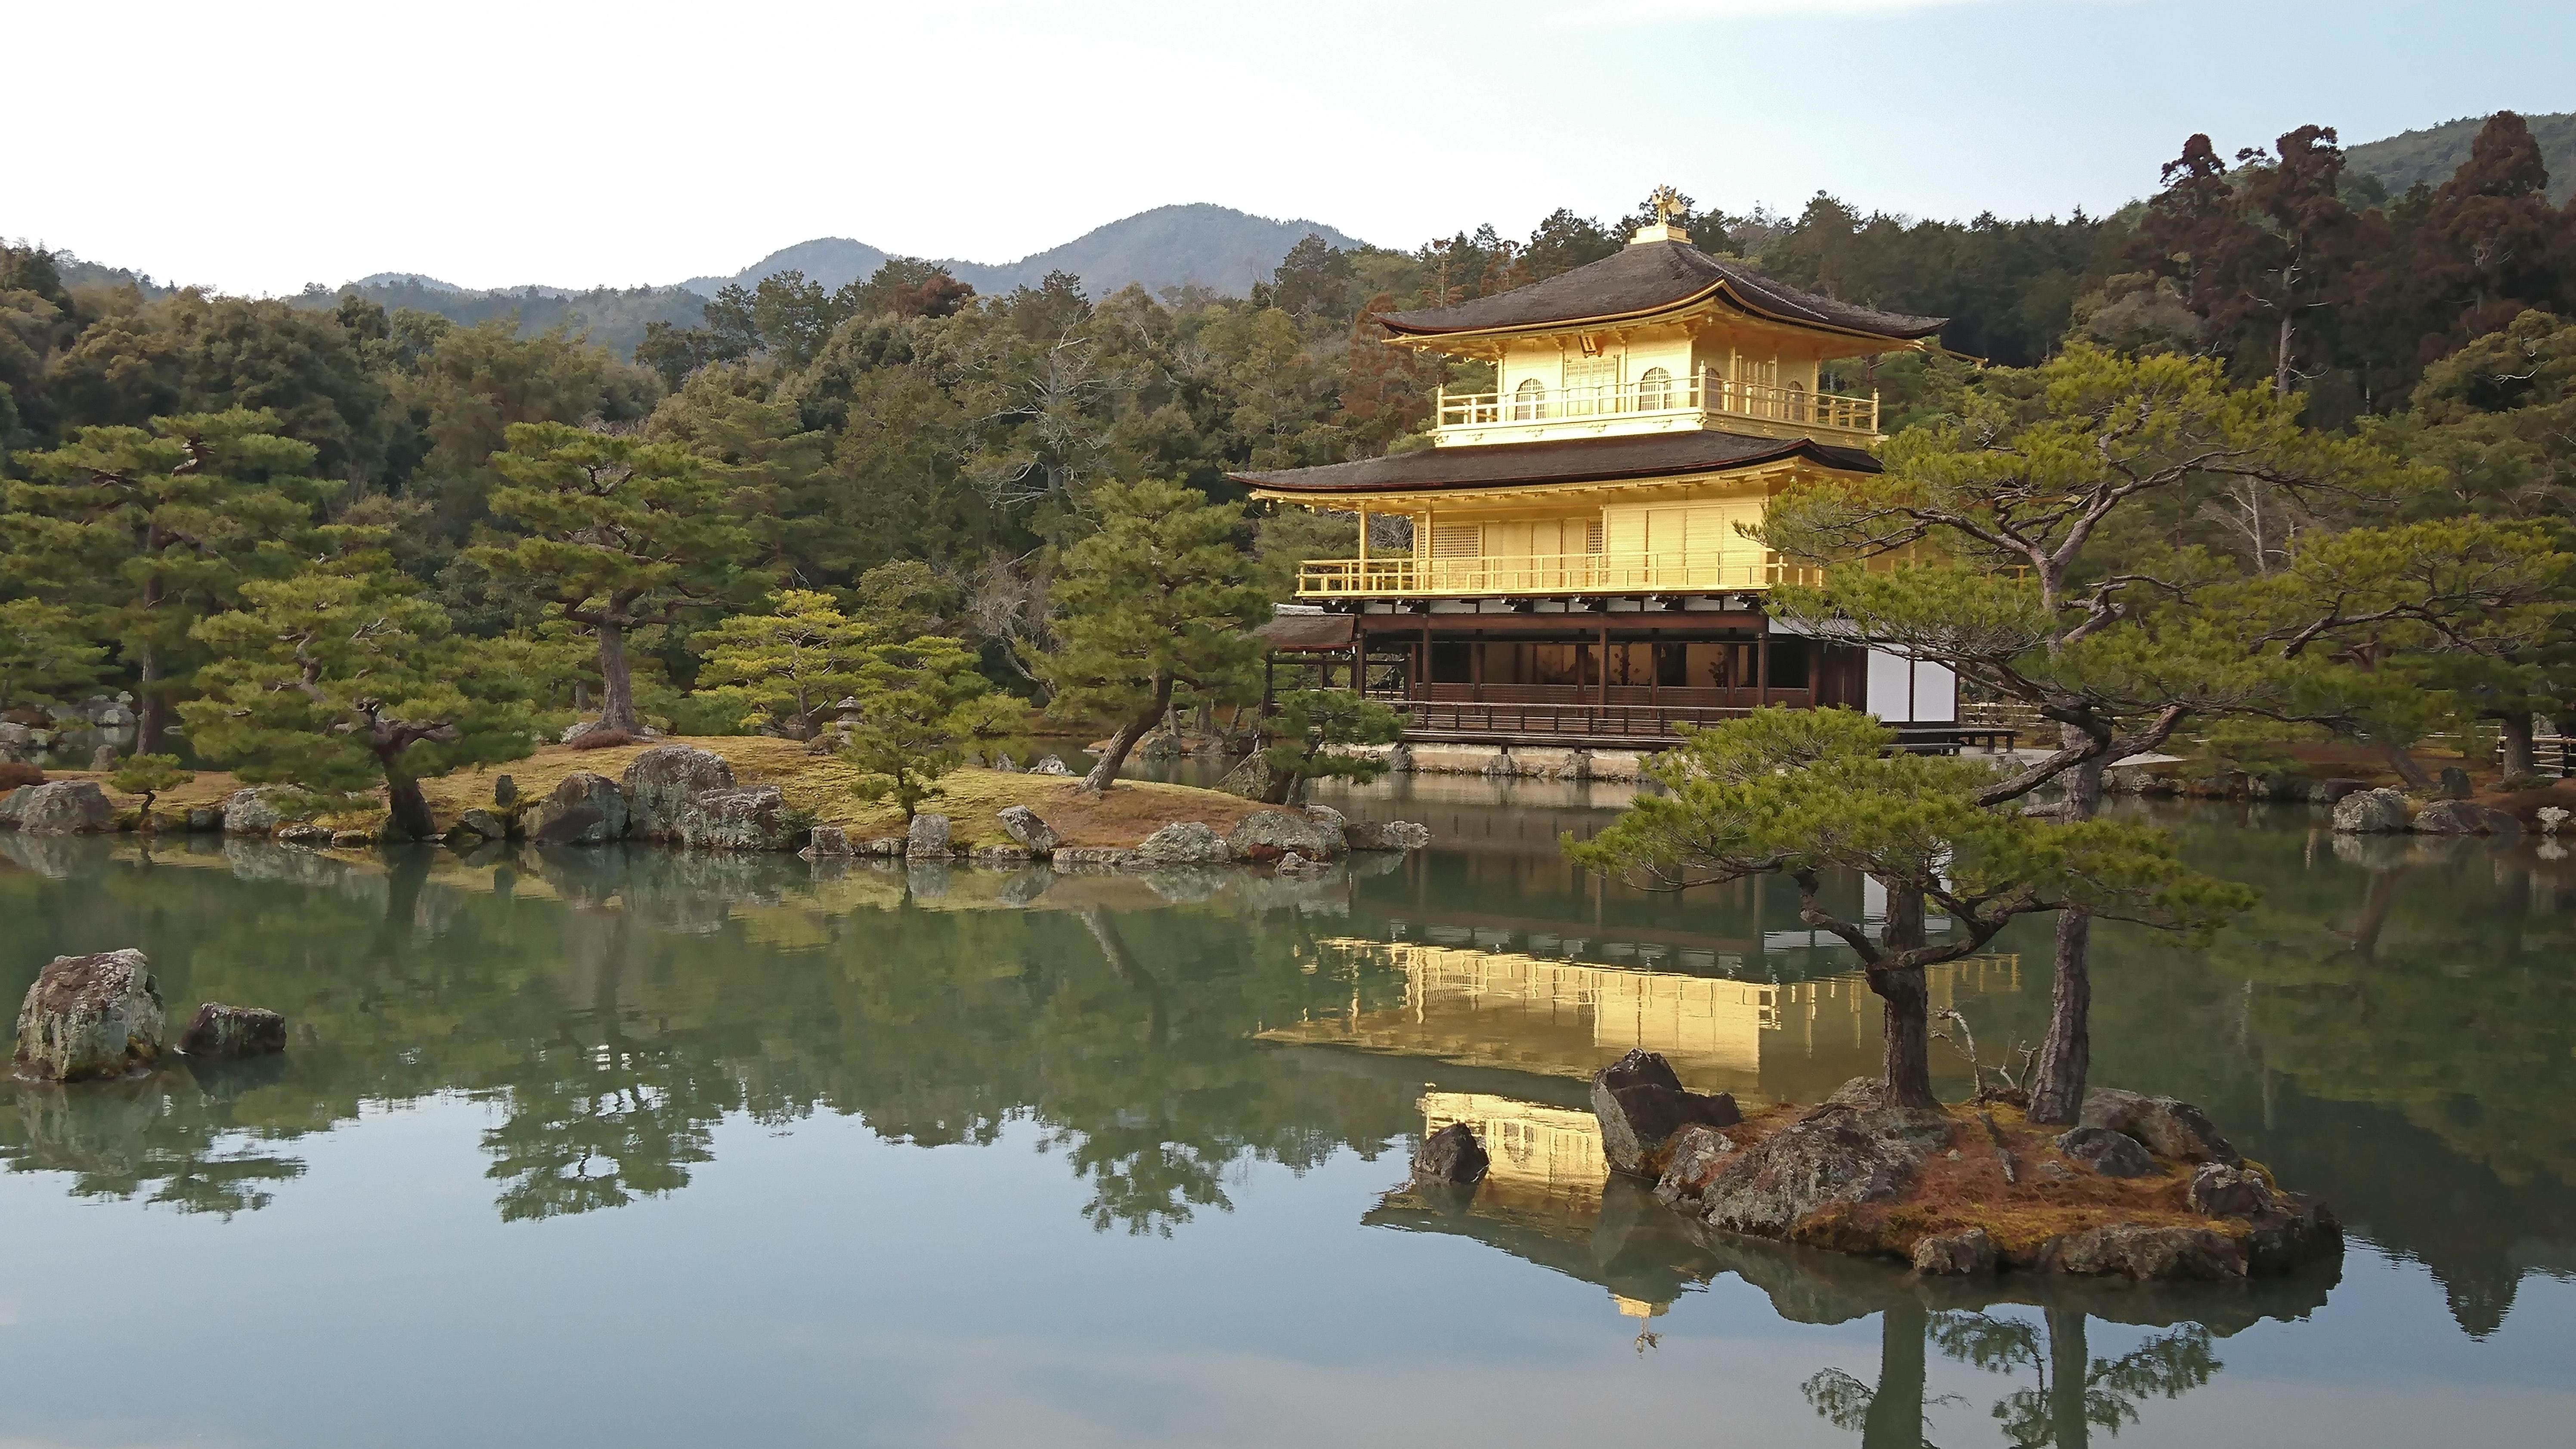 architecture-asia-building-356649.jpg